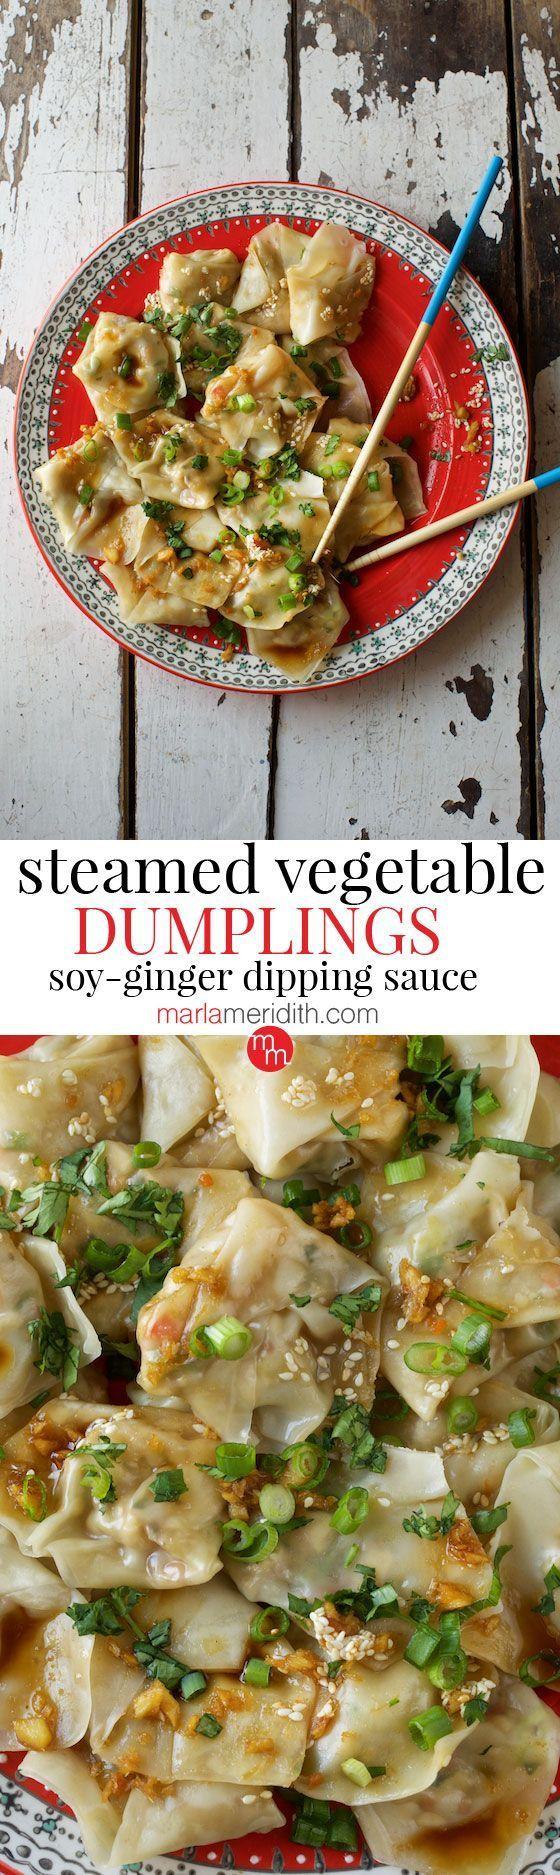 The 25 Best Steamed Vegetables Ideas On Pinterest